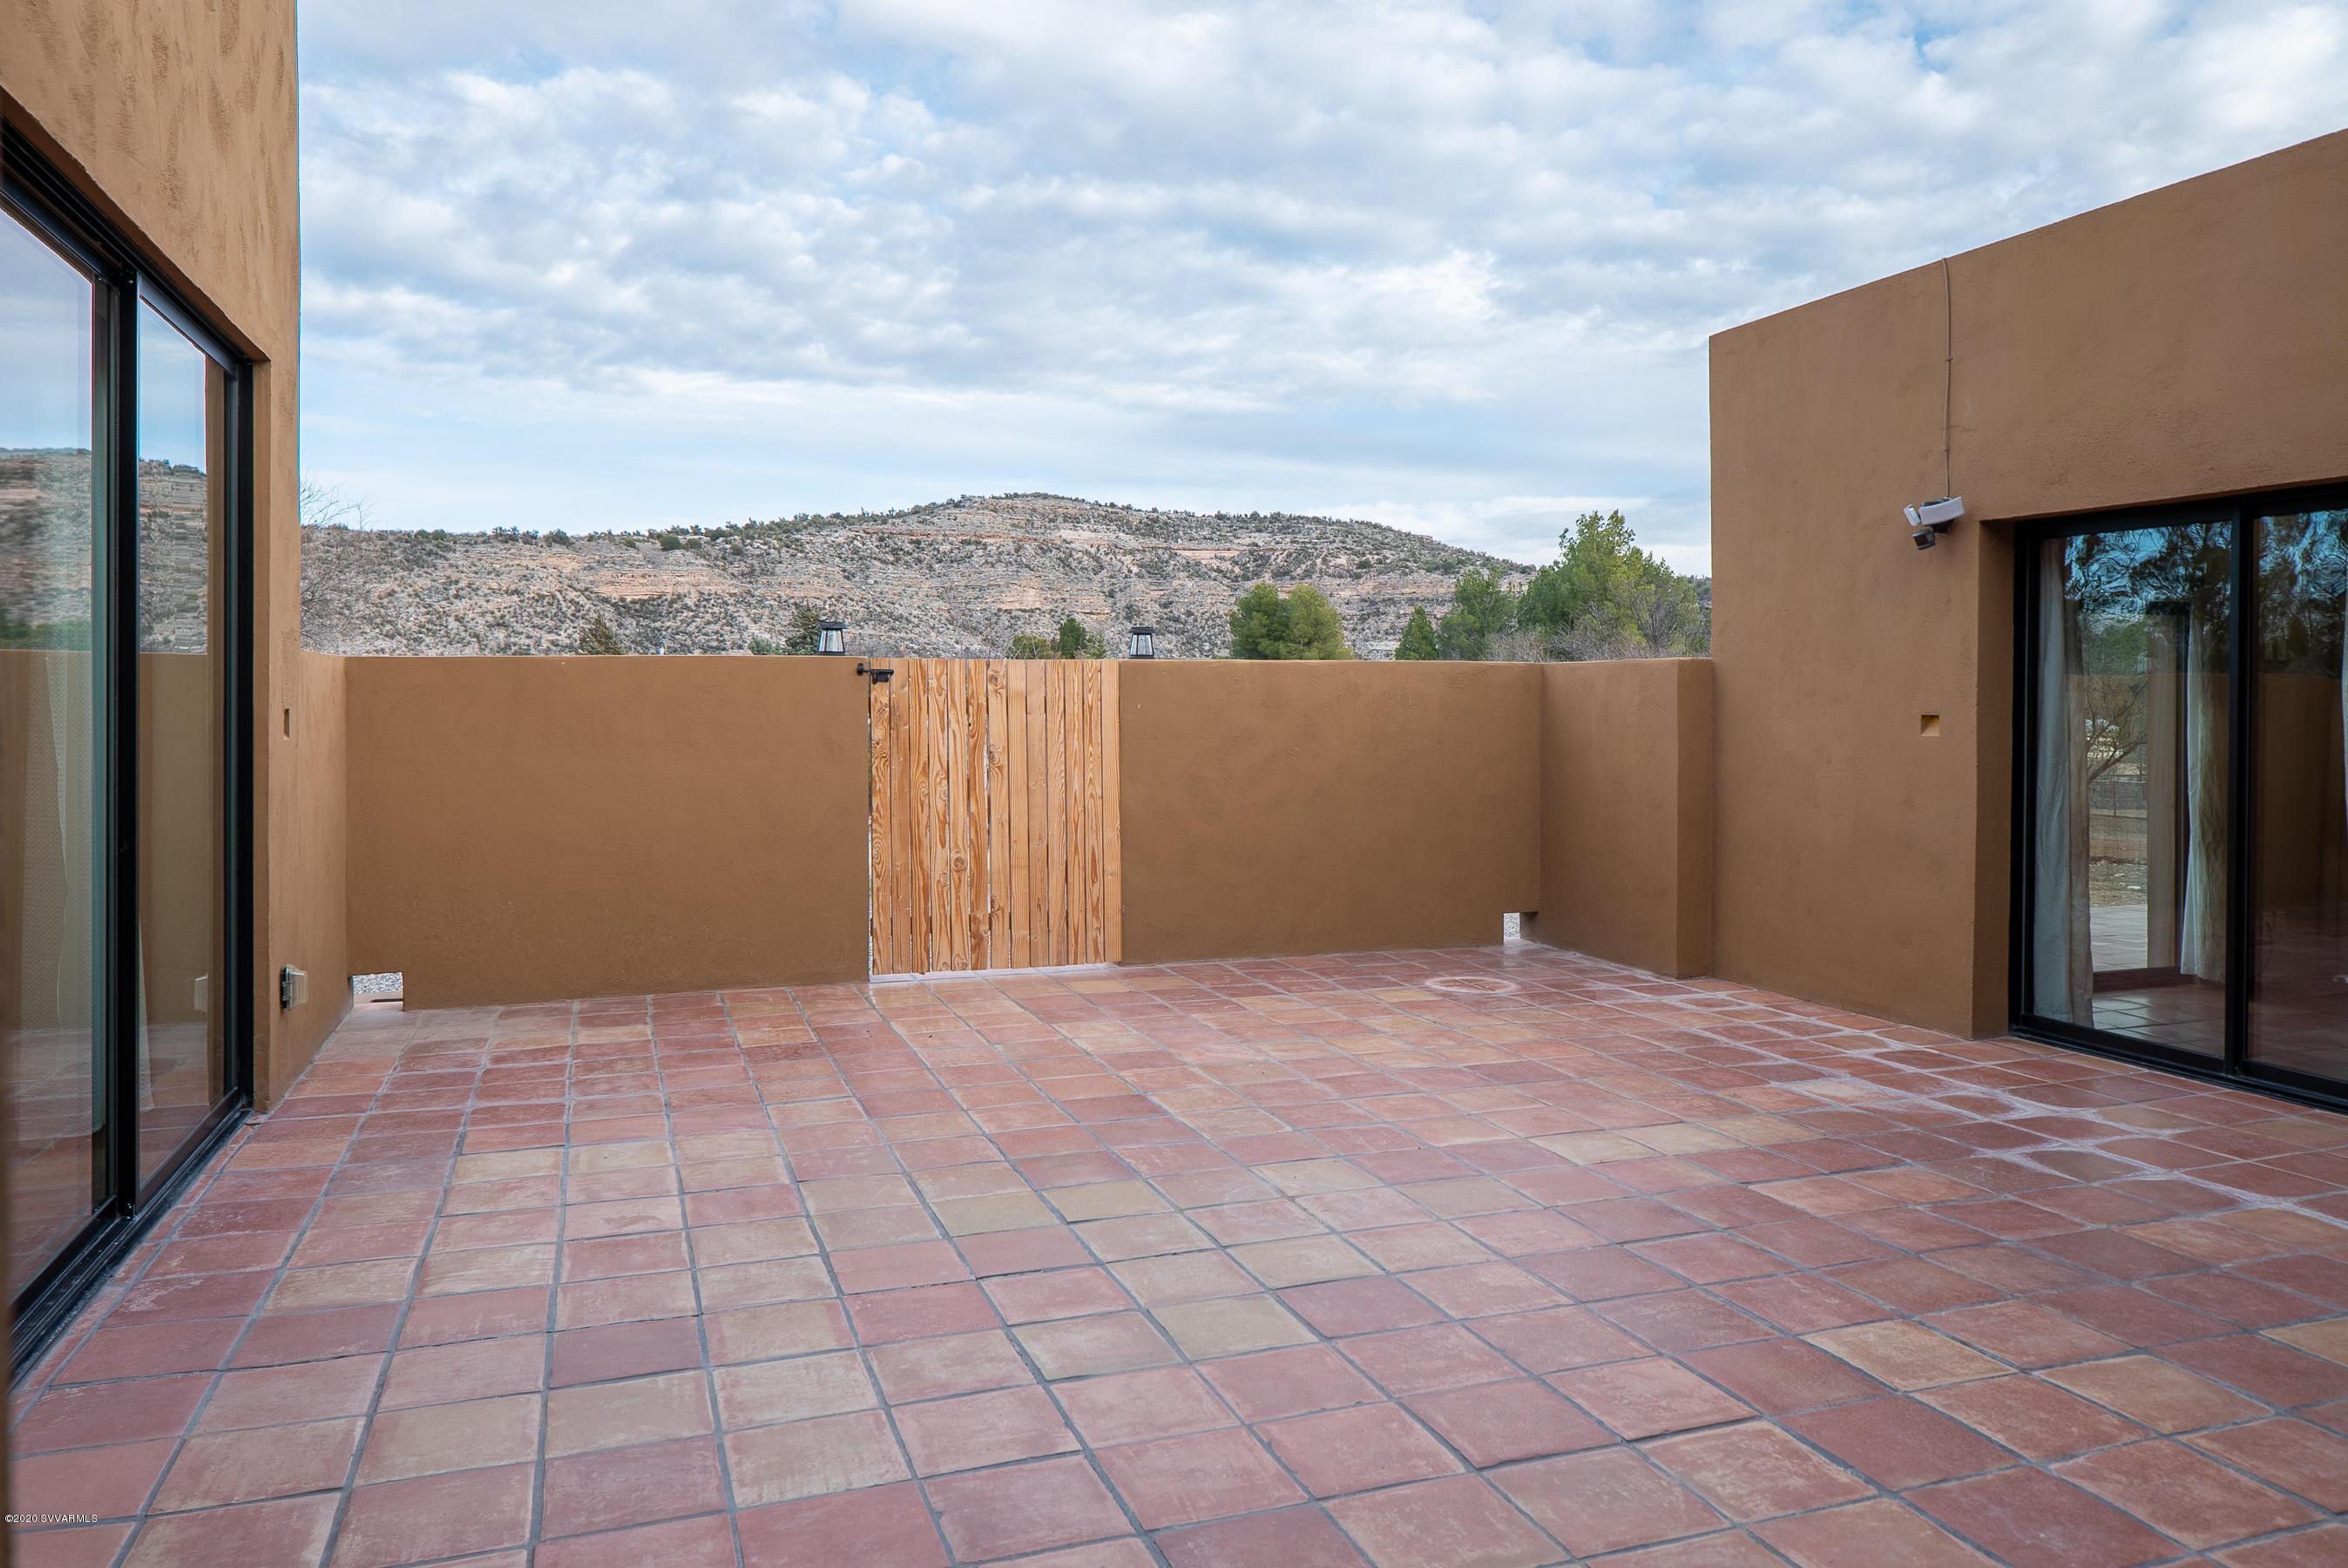 3850 N Stagecoach Rd Camp Verde, AZ 86322